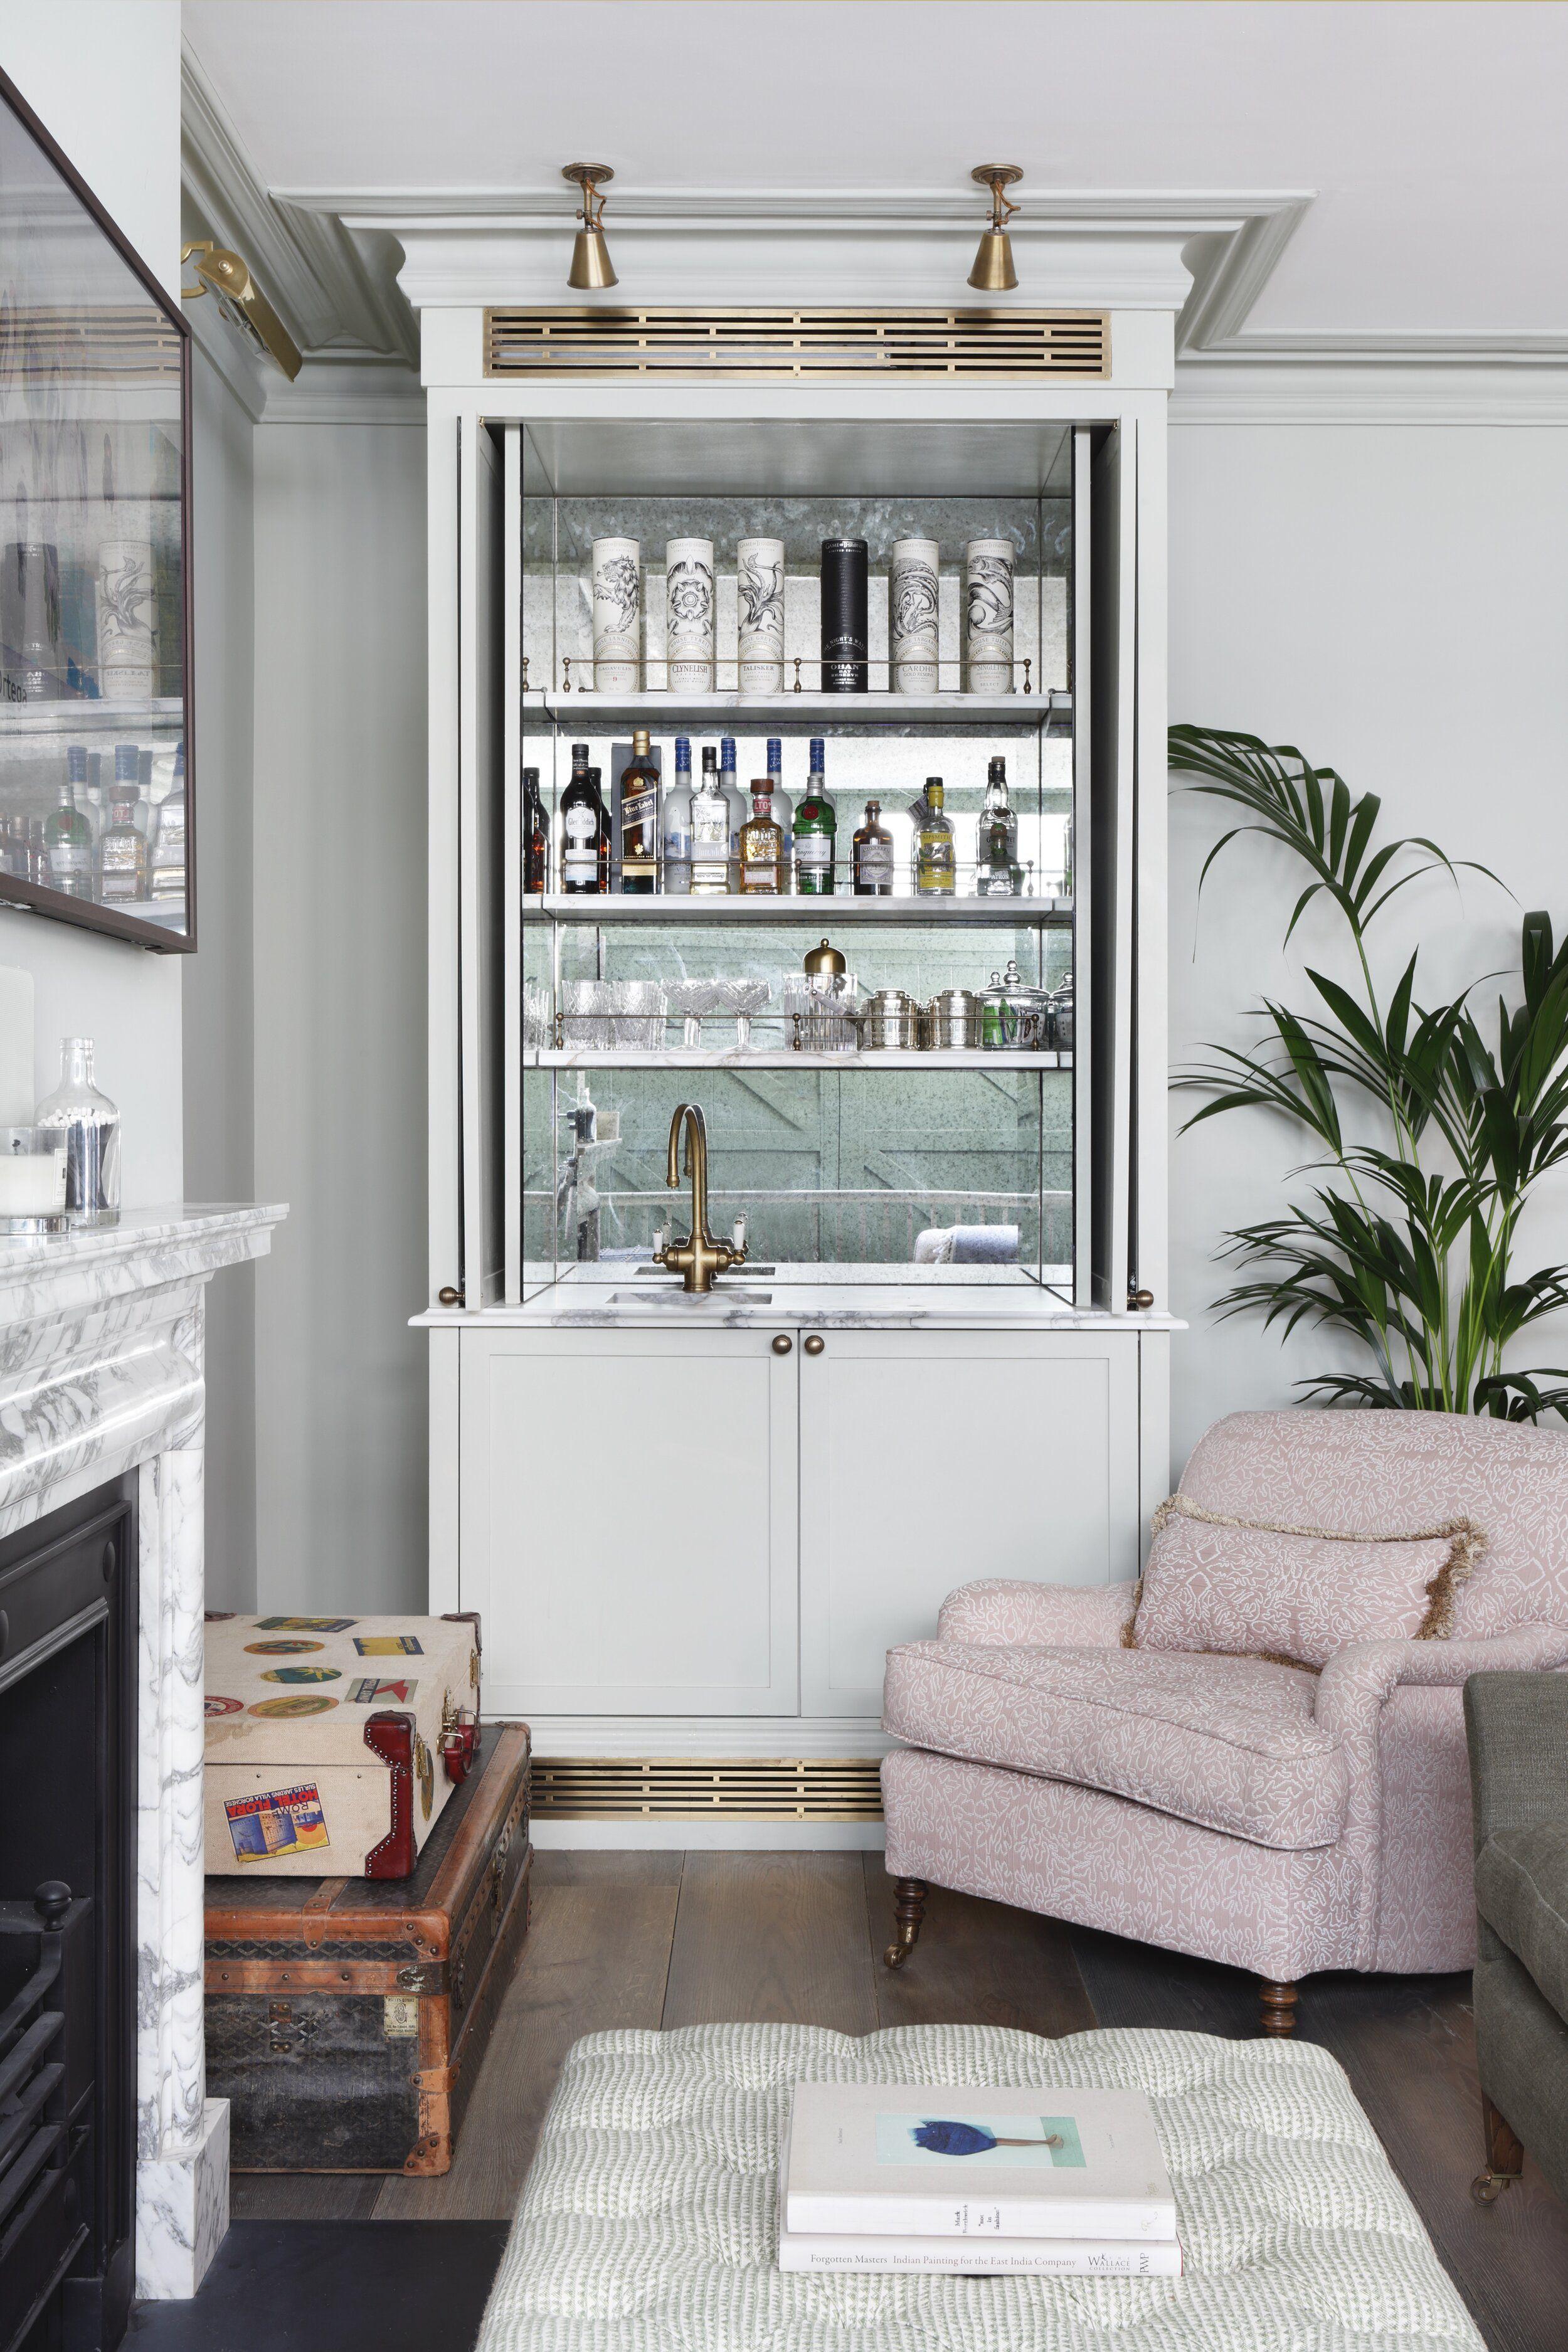 15 Living Room Bar Ideas For Hosting In Any Square Footage Living Room Bar Bar In Living Room Living Room Bar Ideas